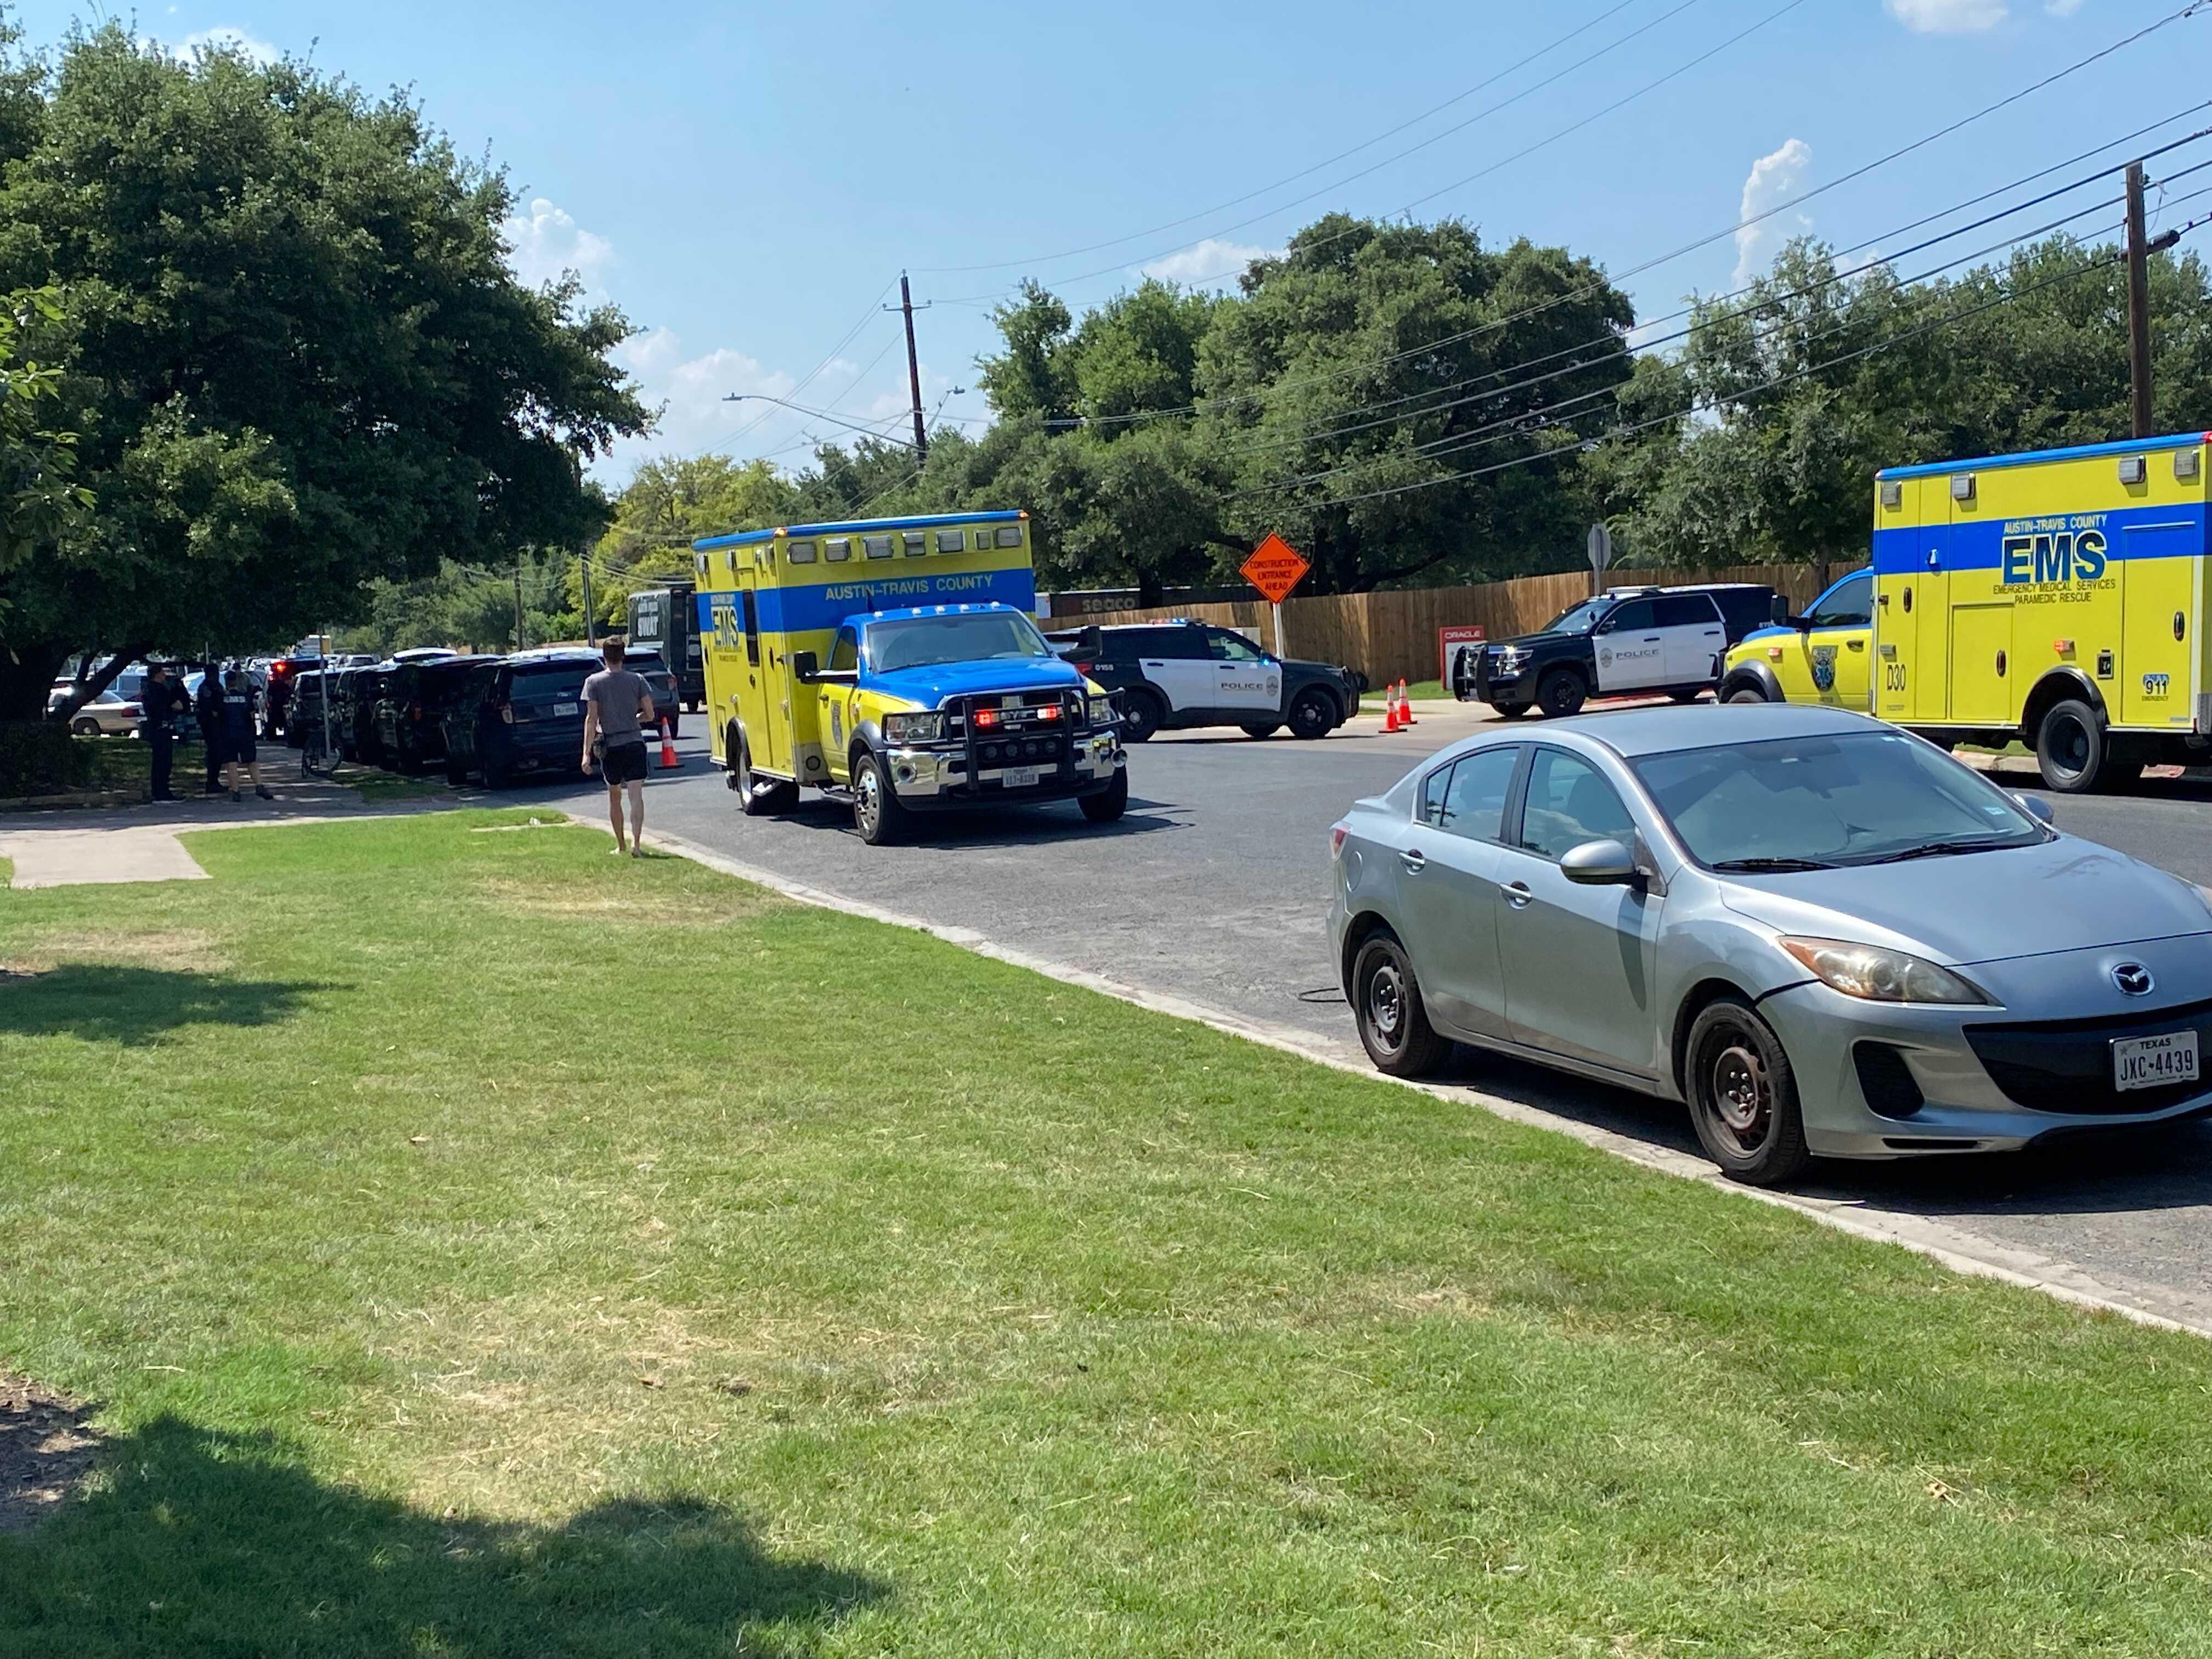 SWAT callout in east Austin near Elmont Drive, Town Lake Circle June 15, 2021 (Courtesy: Victor Belman)